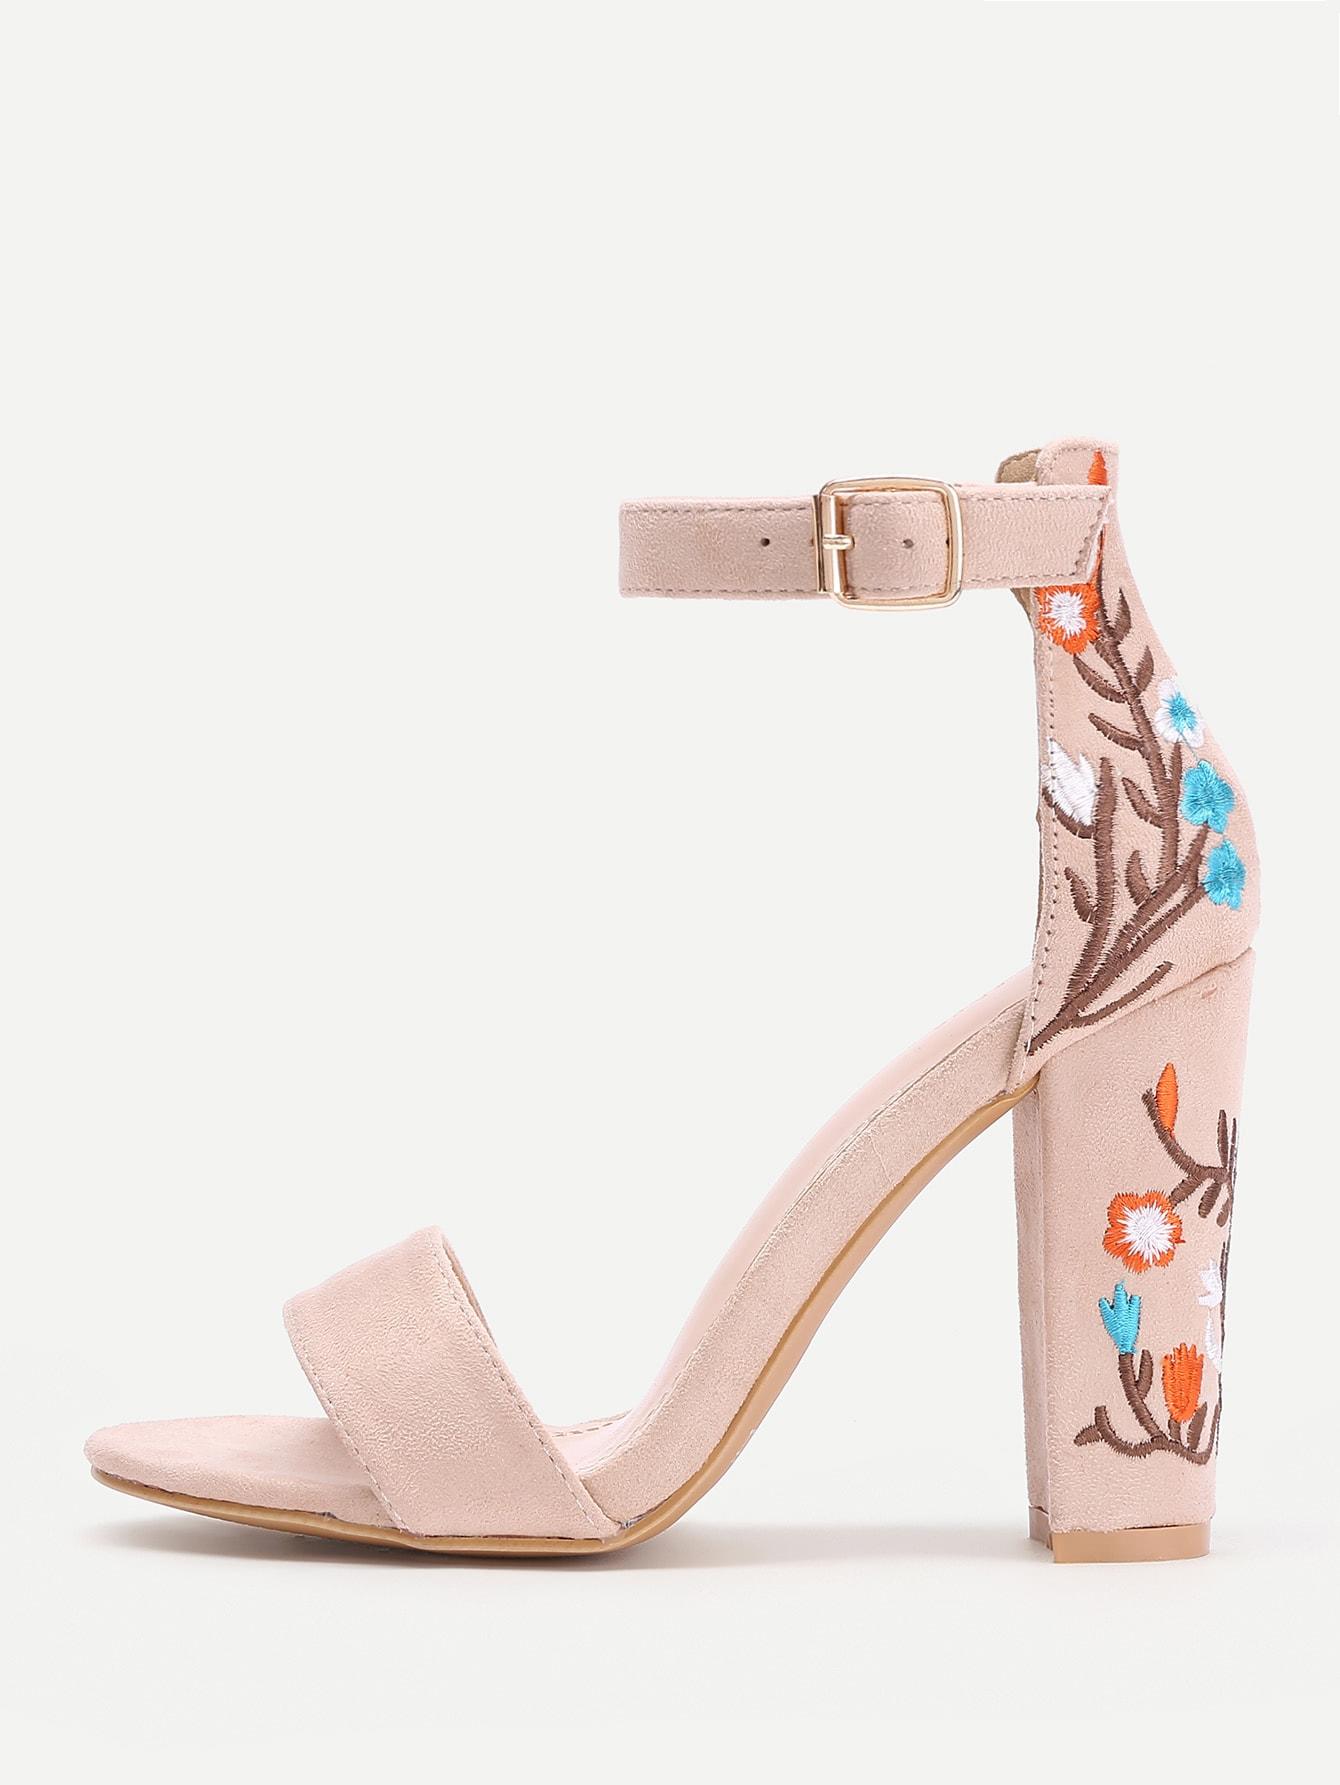 Фото Embroidery Detail Two Part Block Heeled Sandals. Купить с доставкой